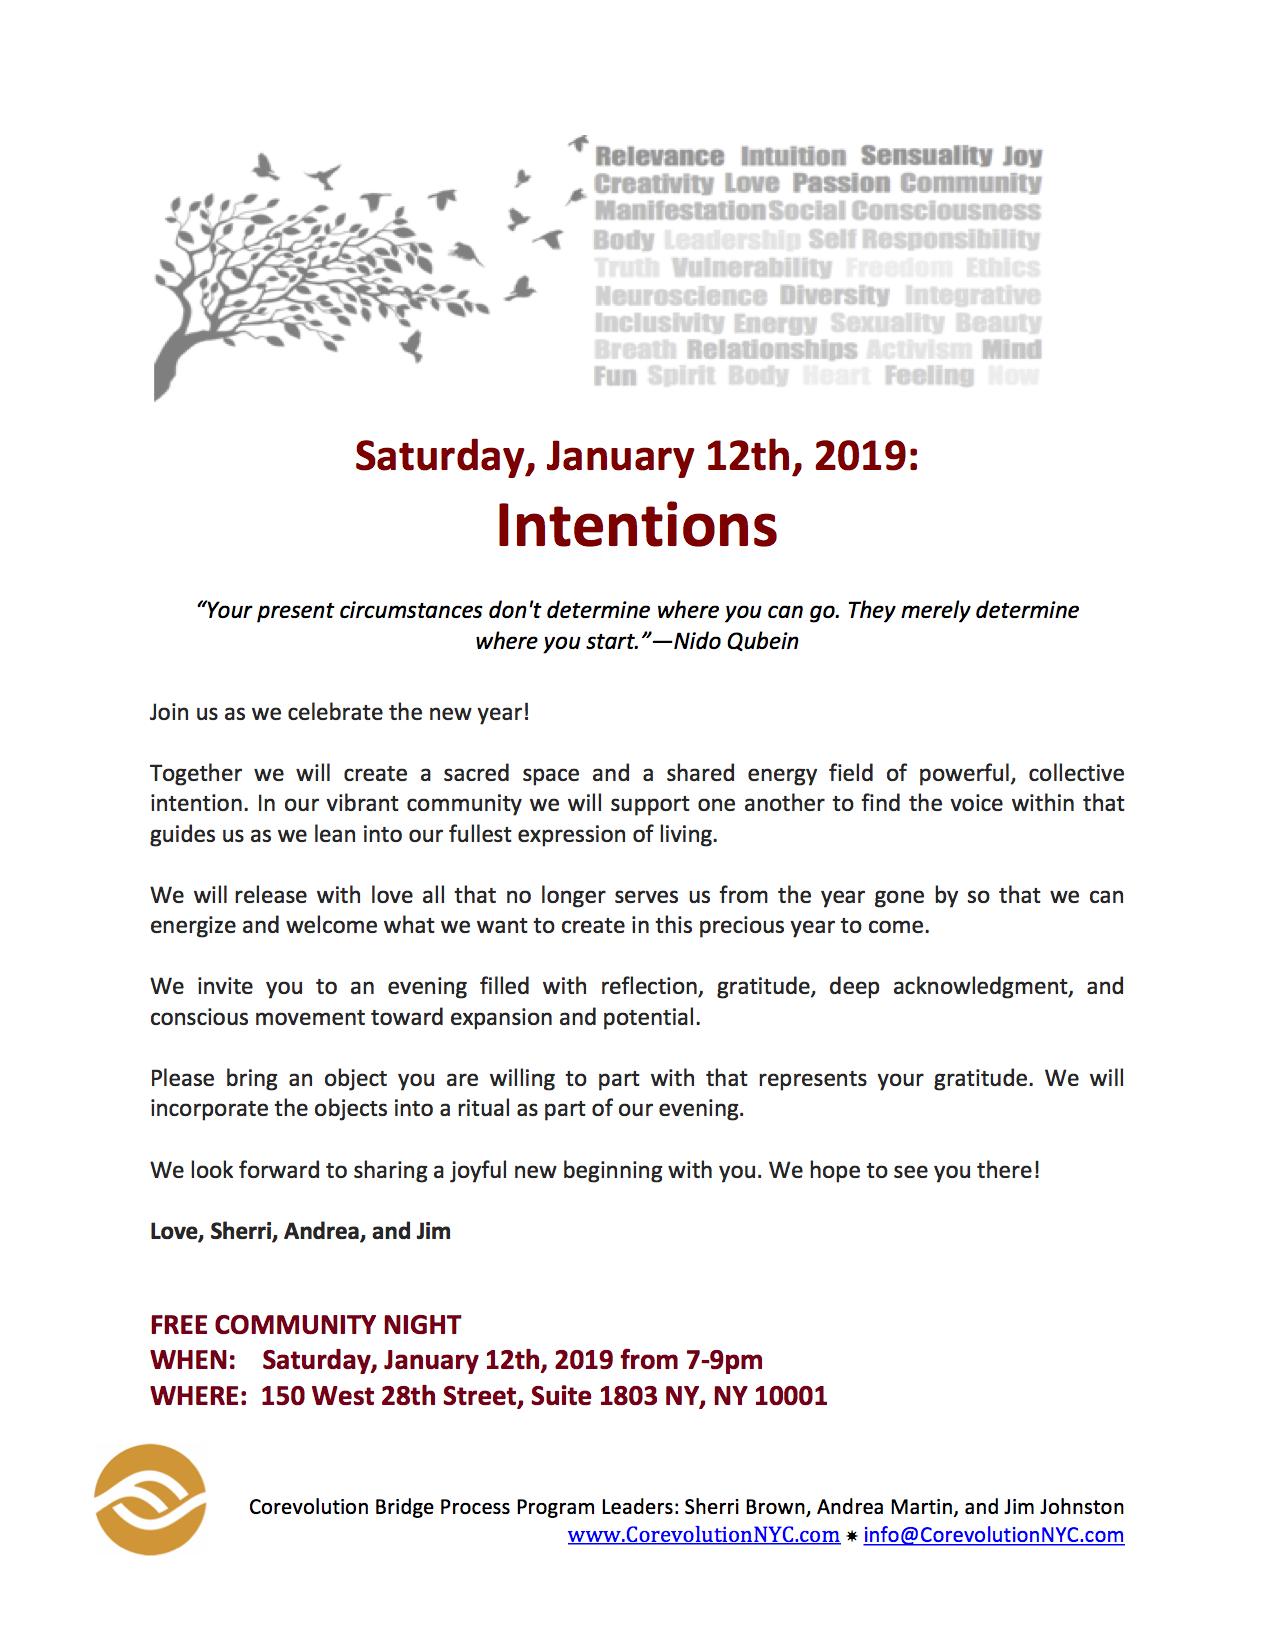 Intentions Community Night flyer 01_12_19.jpg